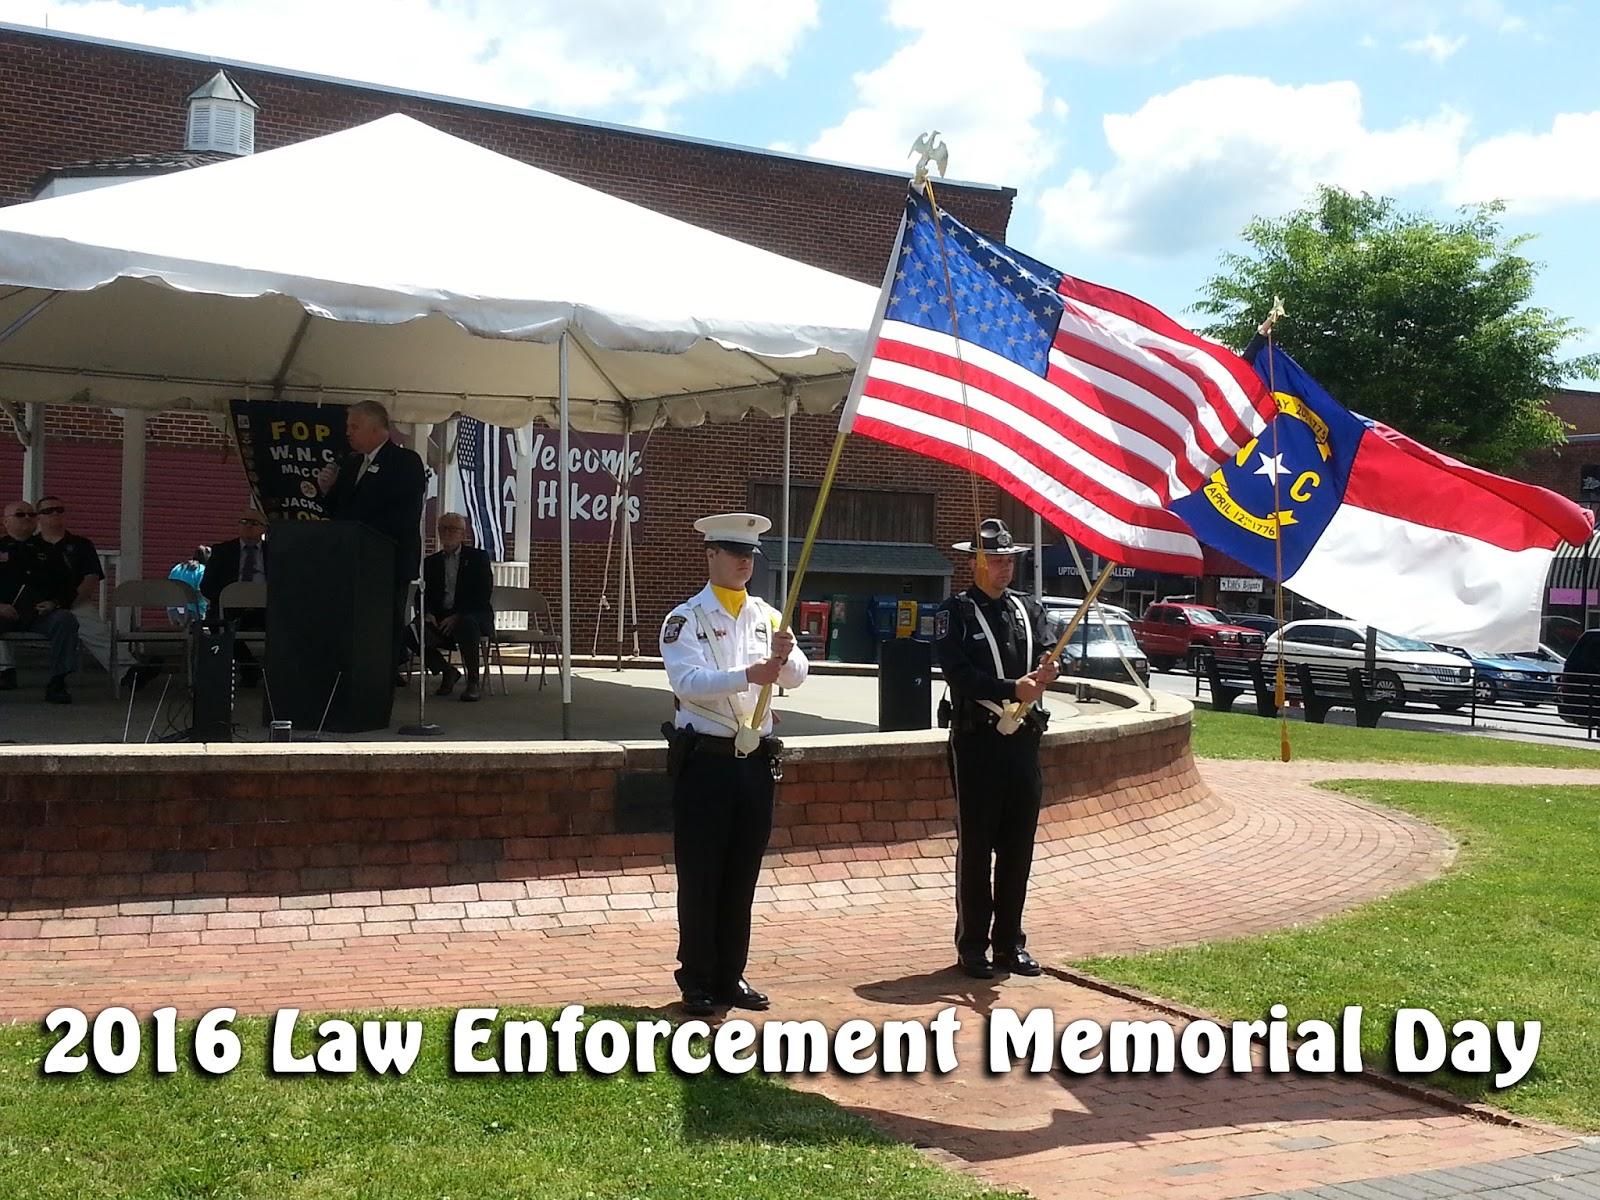 2016 Law Enforcement Memorial Day